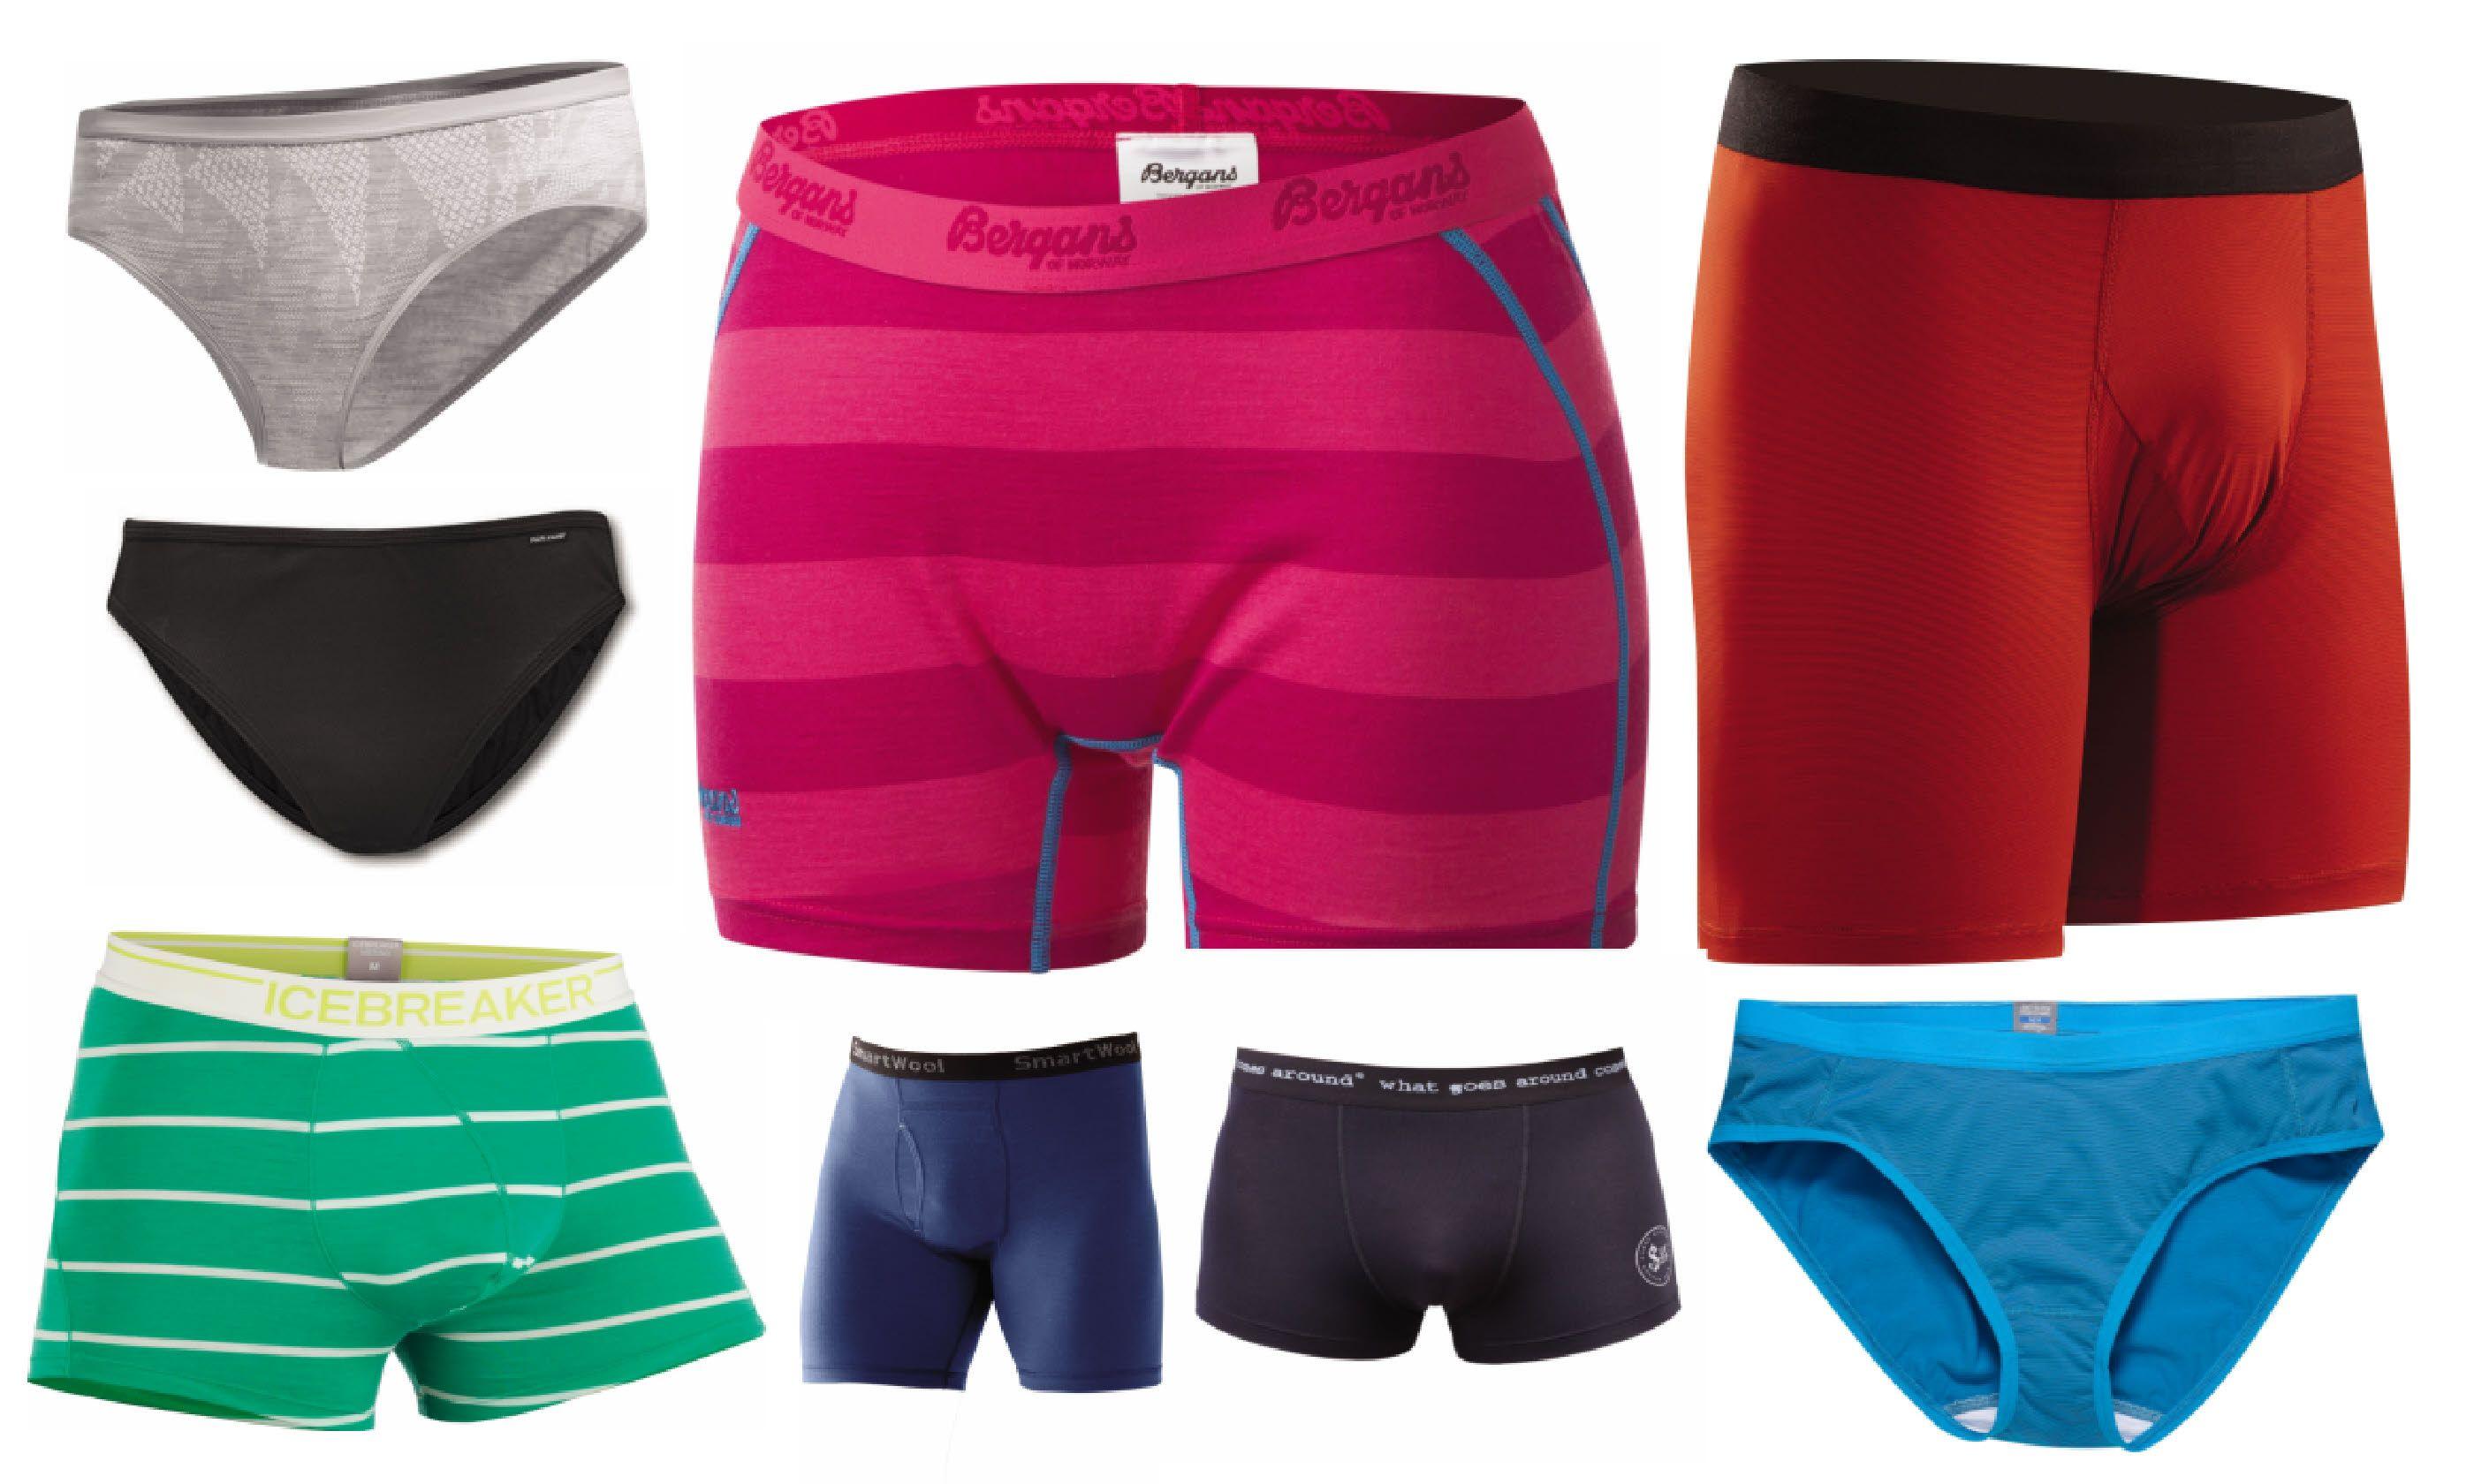 Safari African Animal Boxer Briefs Mens Underwear Pack Seamless Comfort Soft